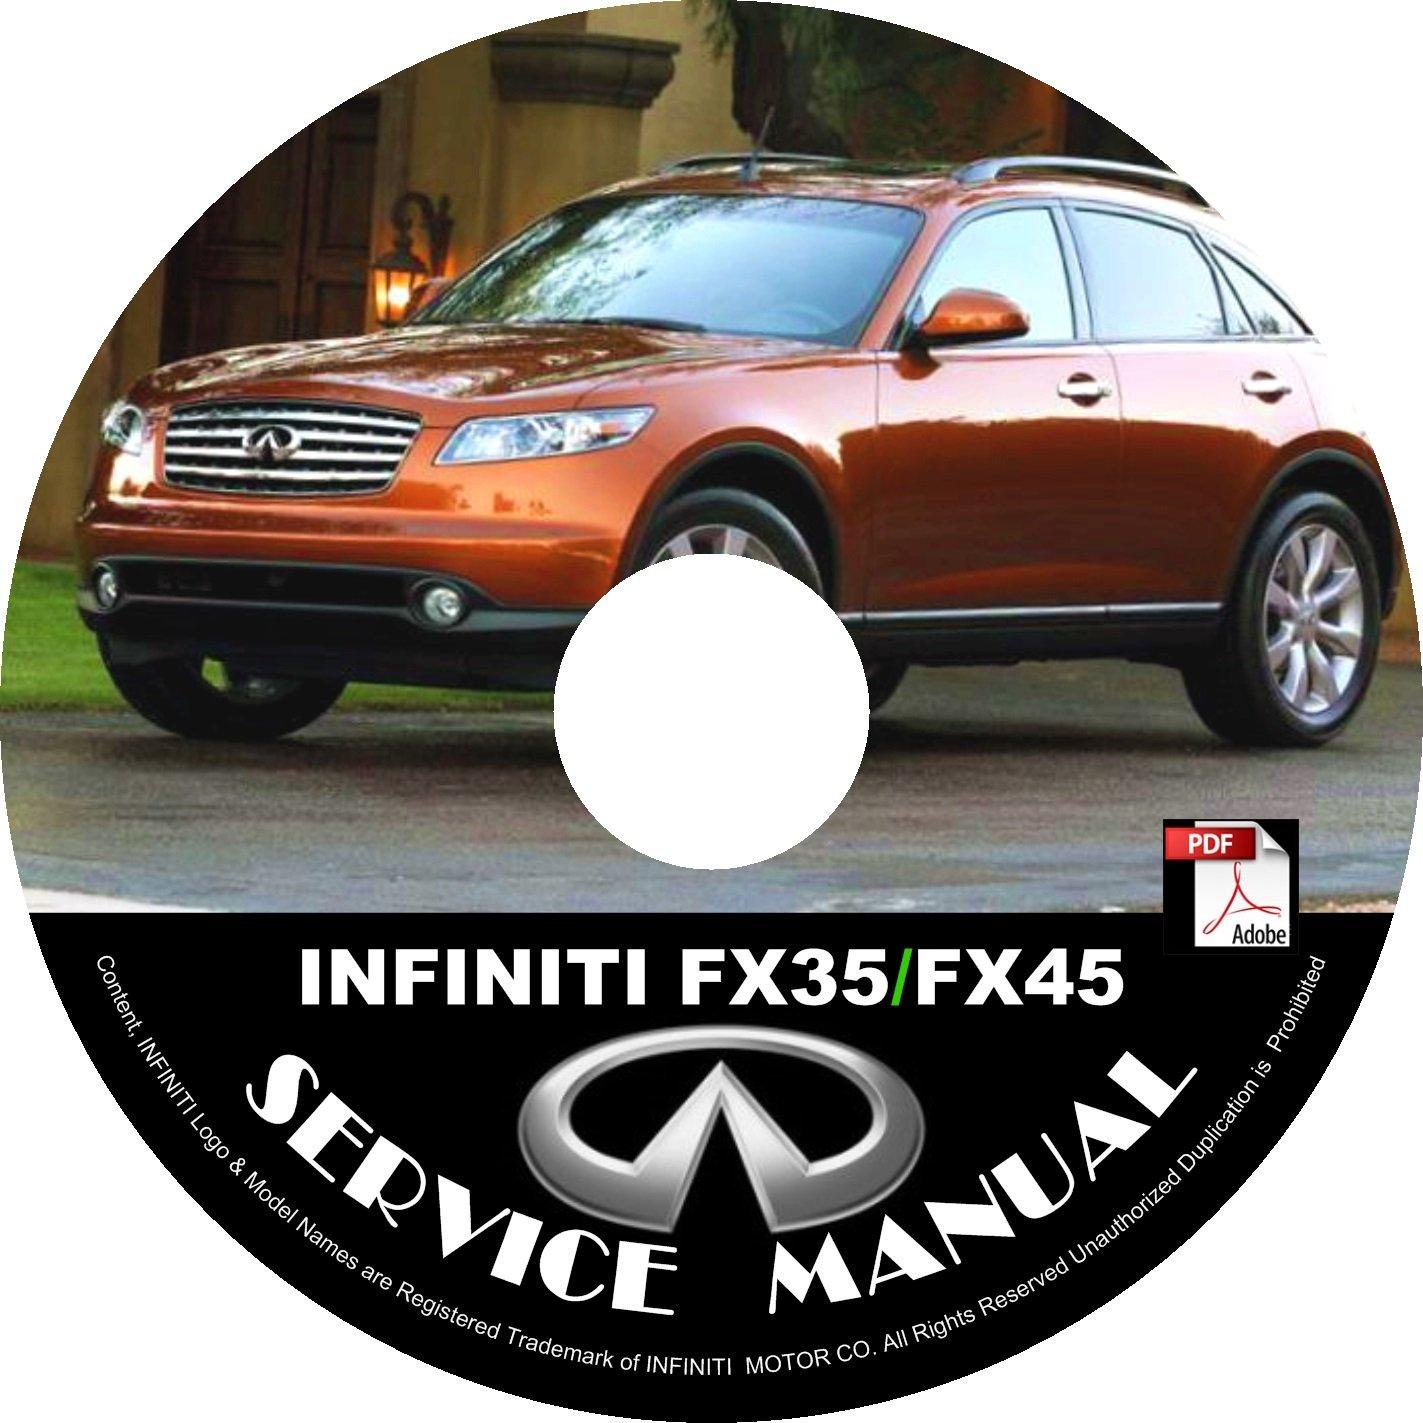 2007 Infiniti FX35-FX45 Factory Service Repair Shop Manual on CD Fix Repair Rebuild 07 Workshop